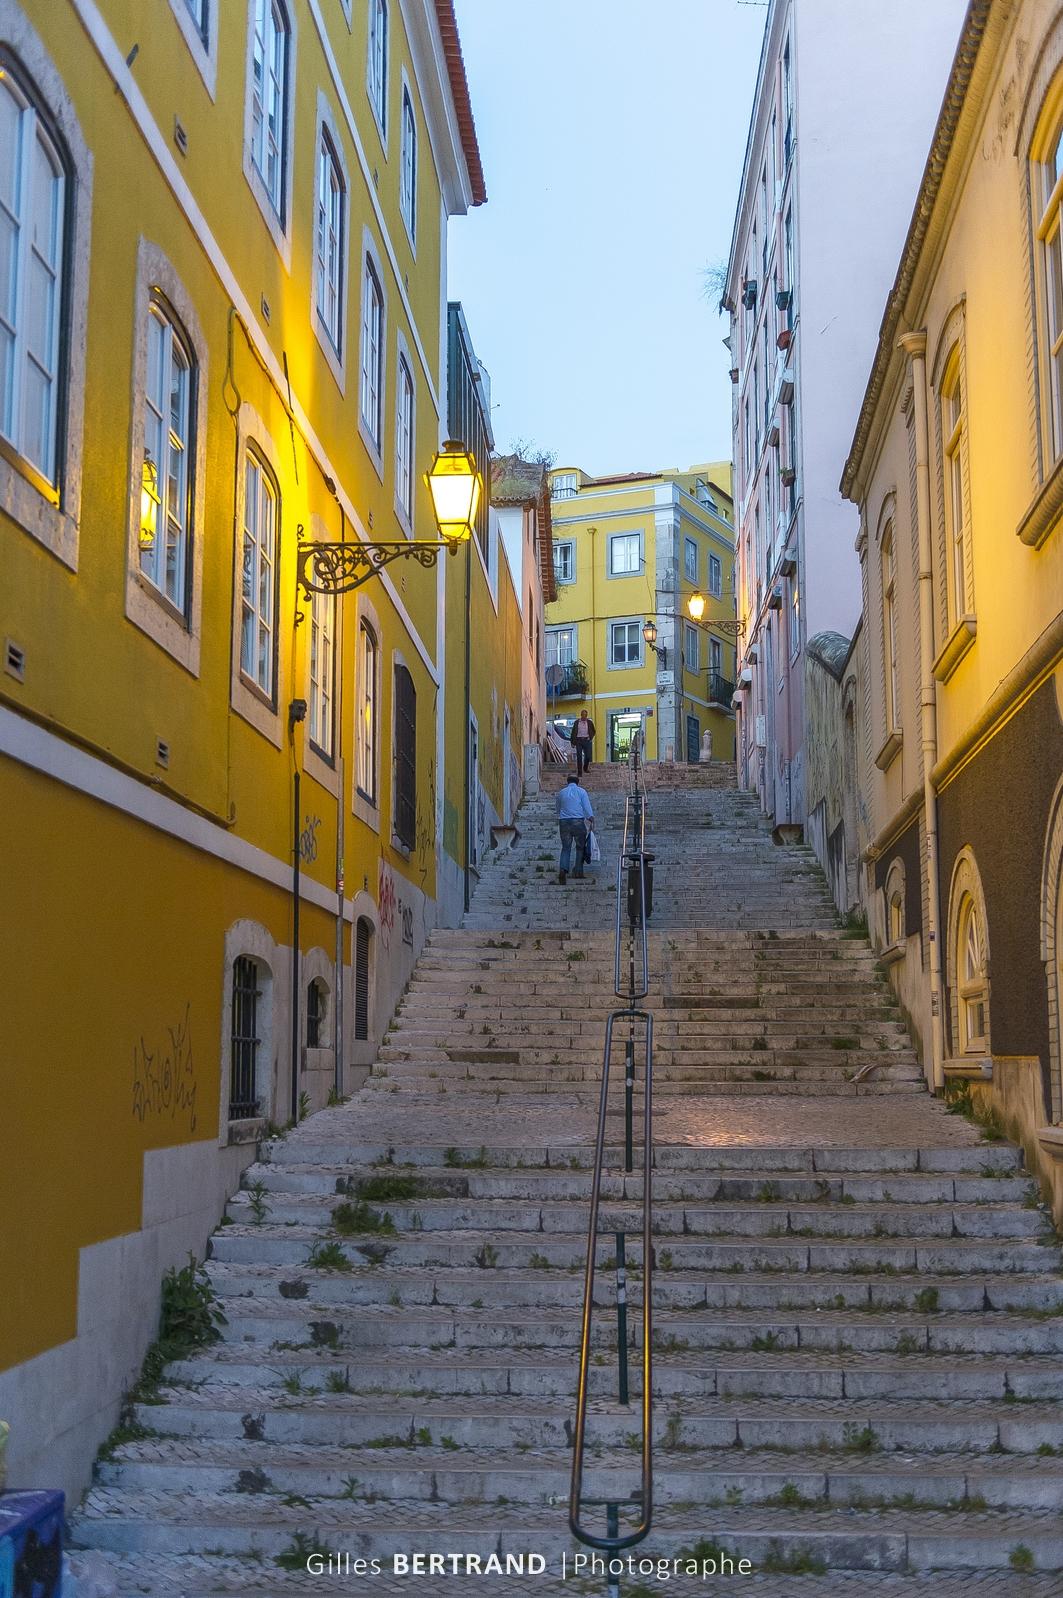 LISBONNE - Rue pietonne en escalier. A Lisbonne